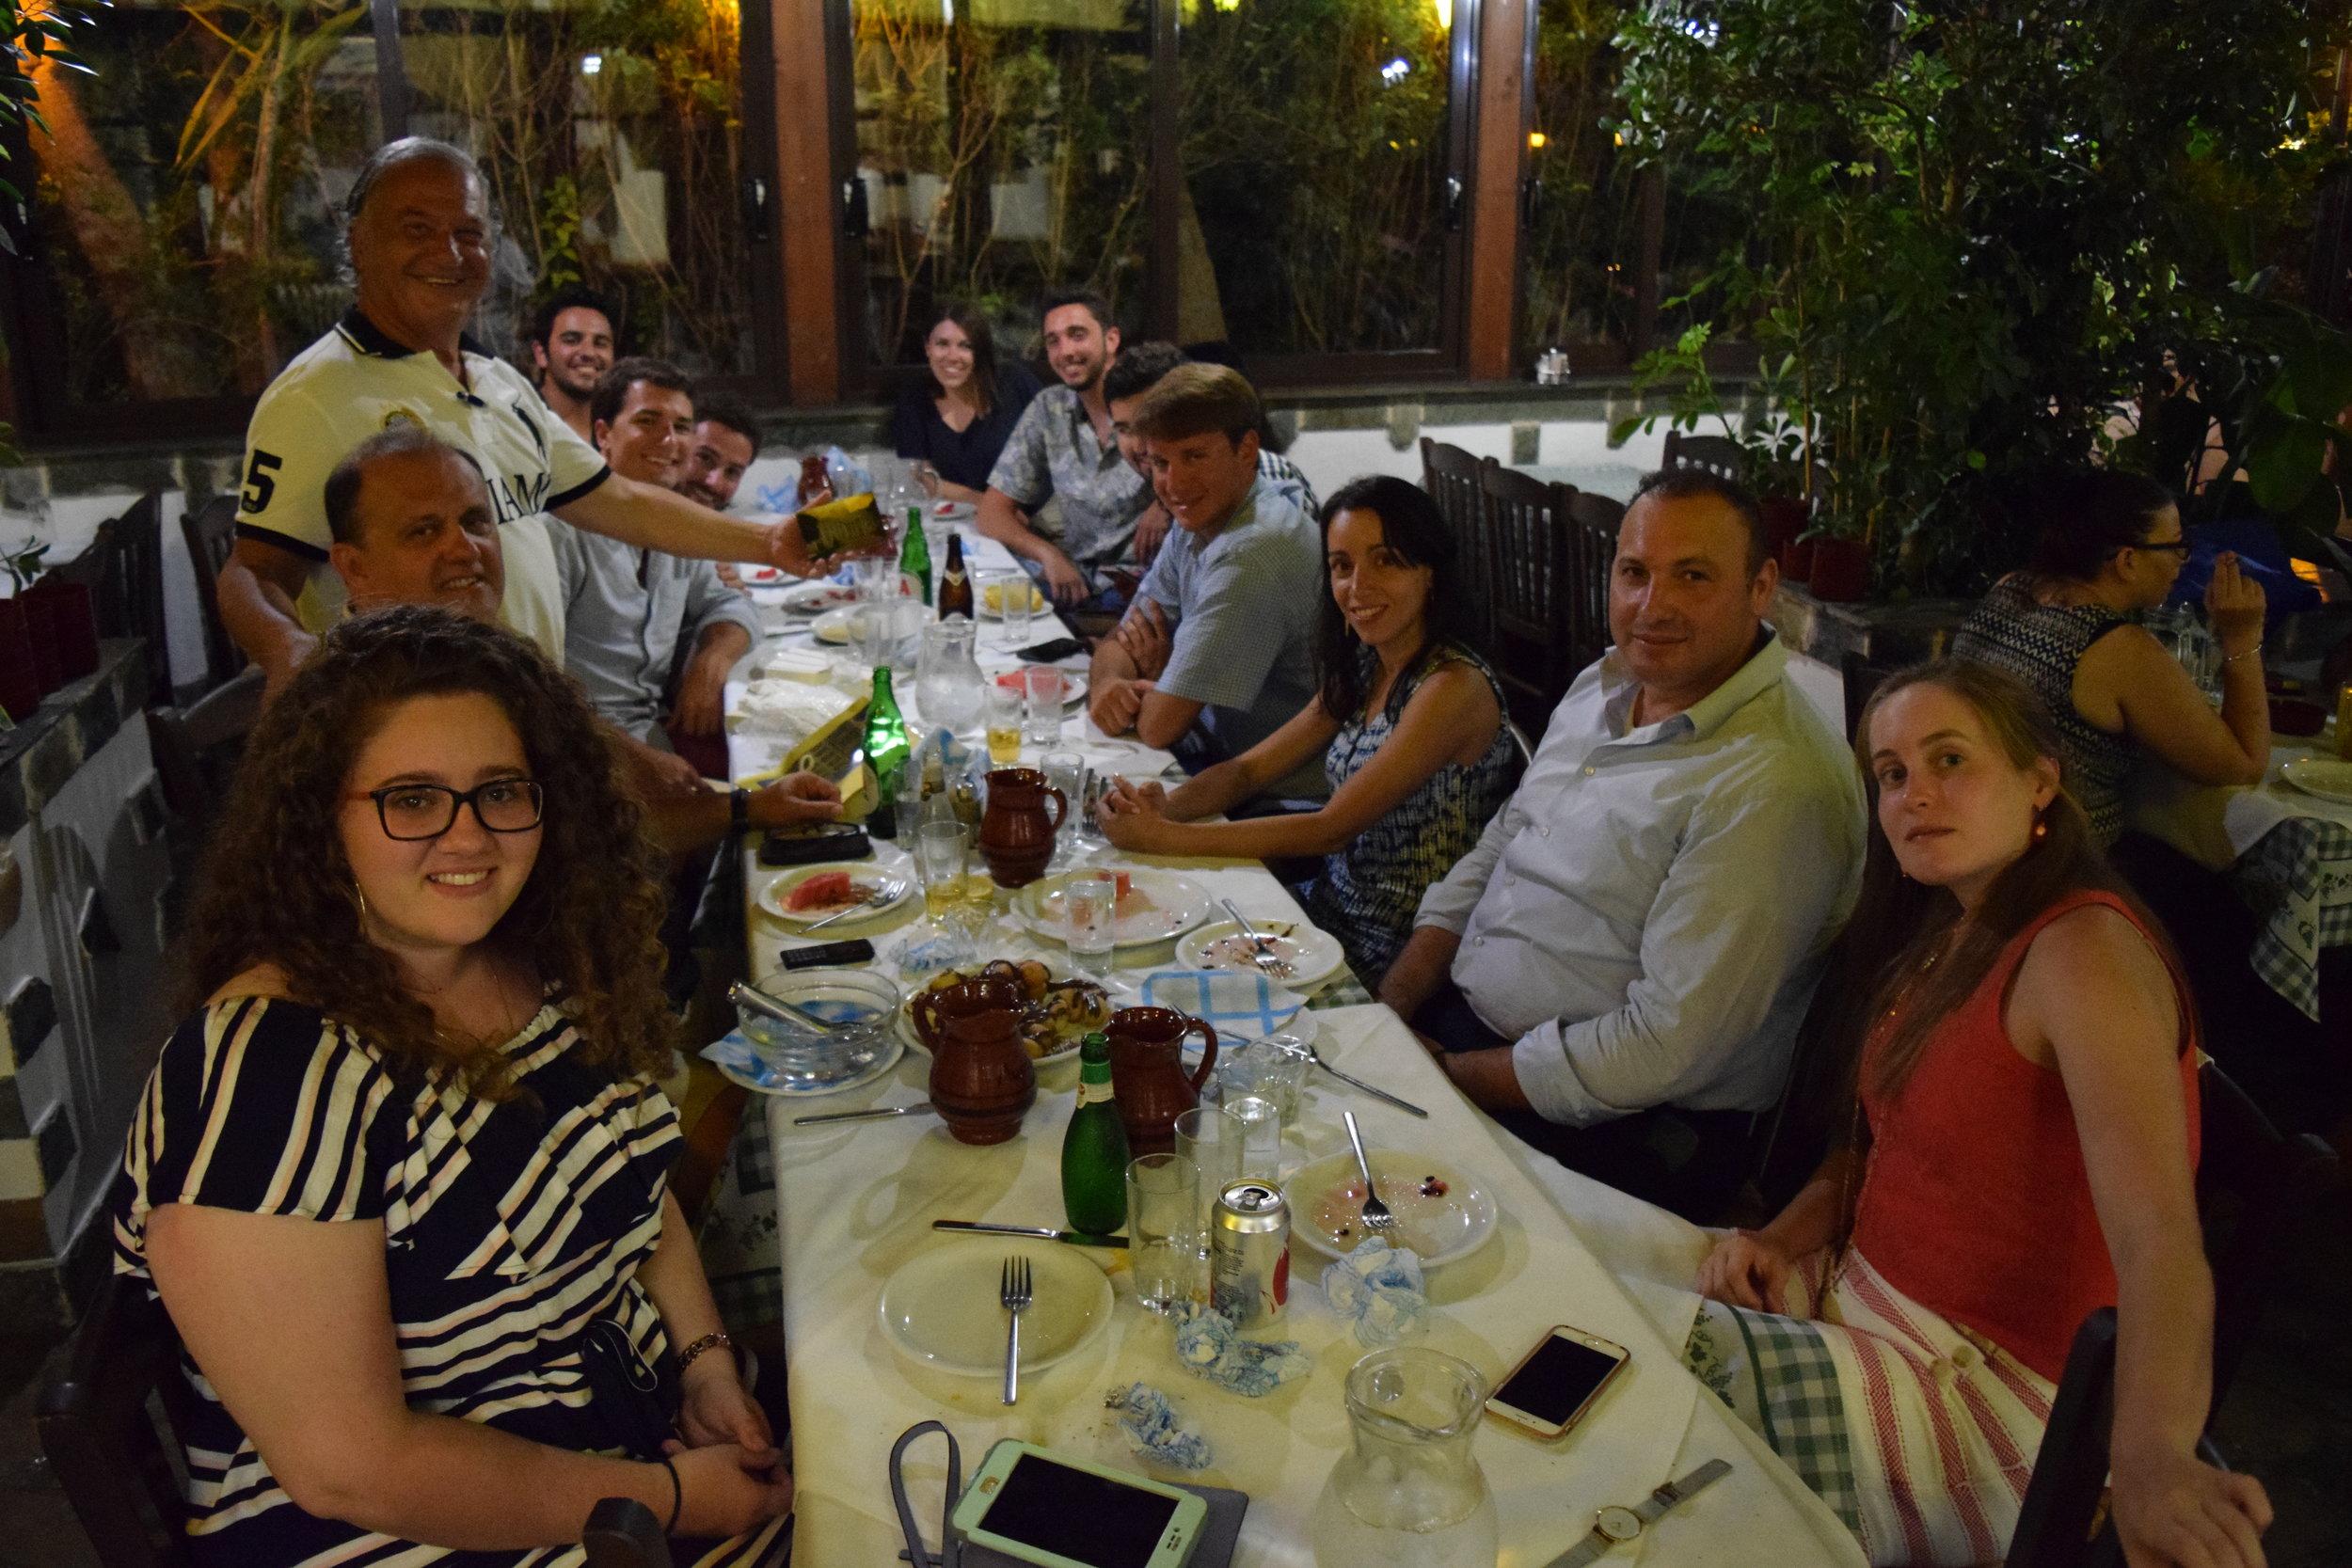 Dinner at Myrtia restaurant, hosted by George Mermelas.